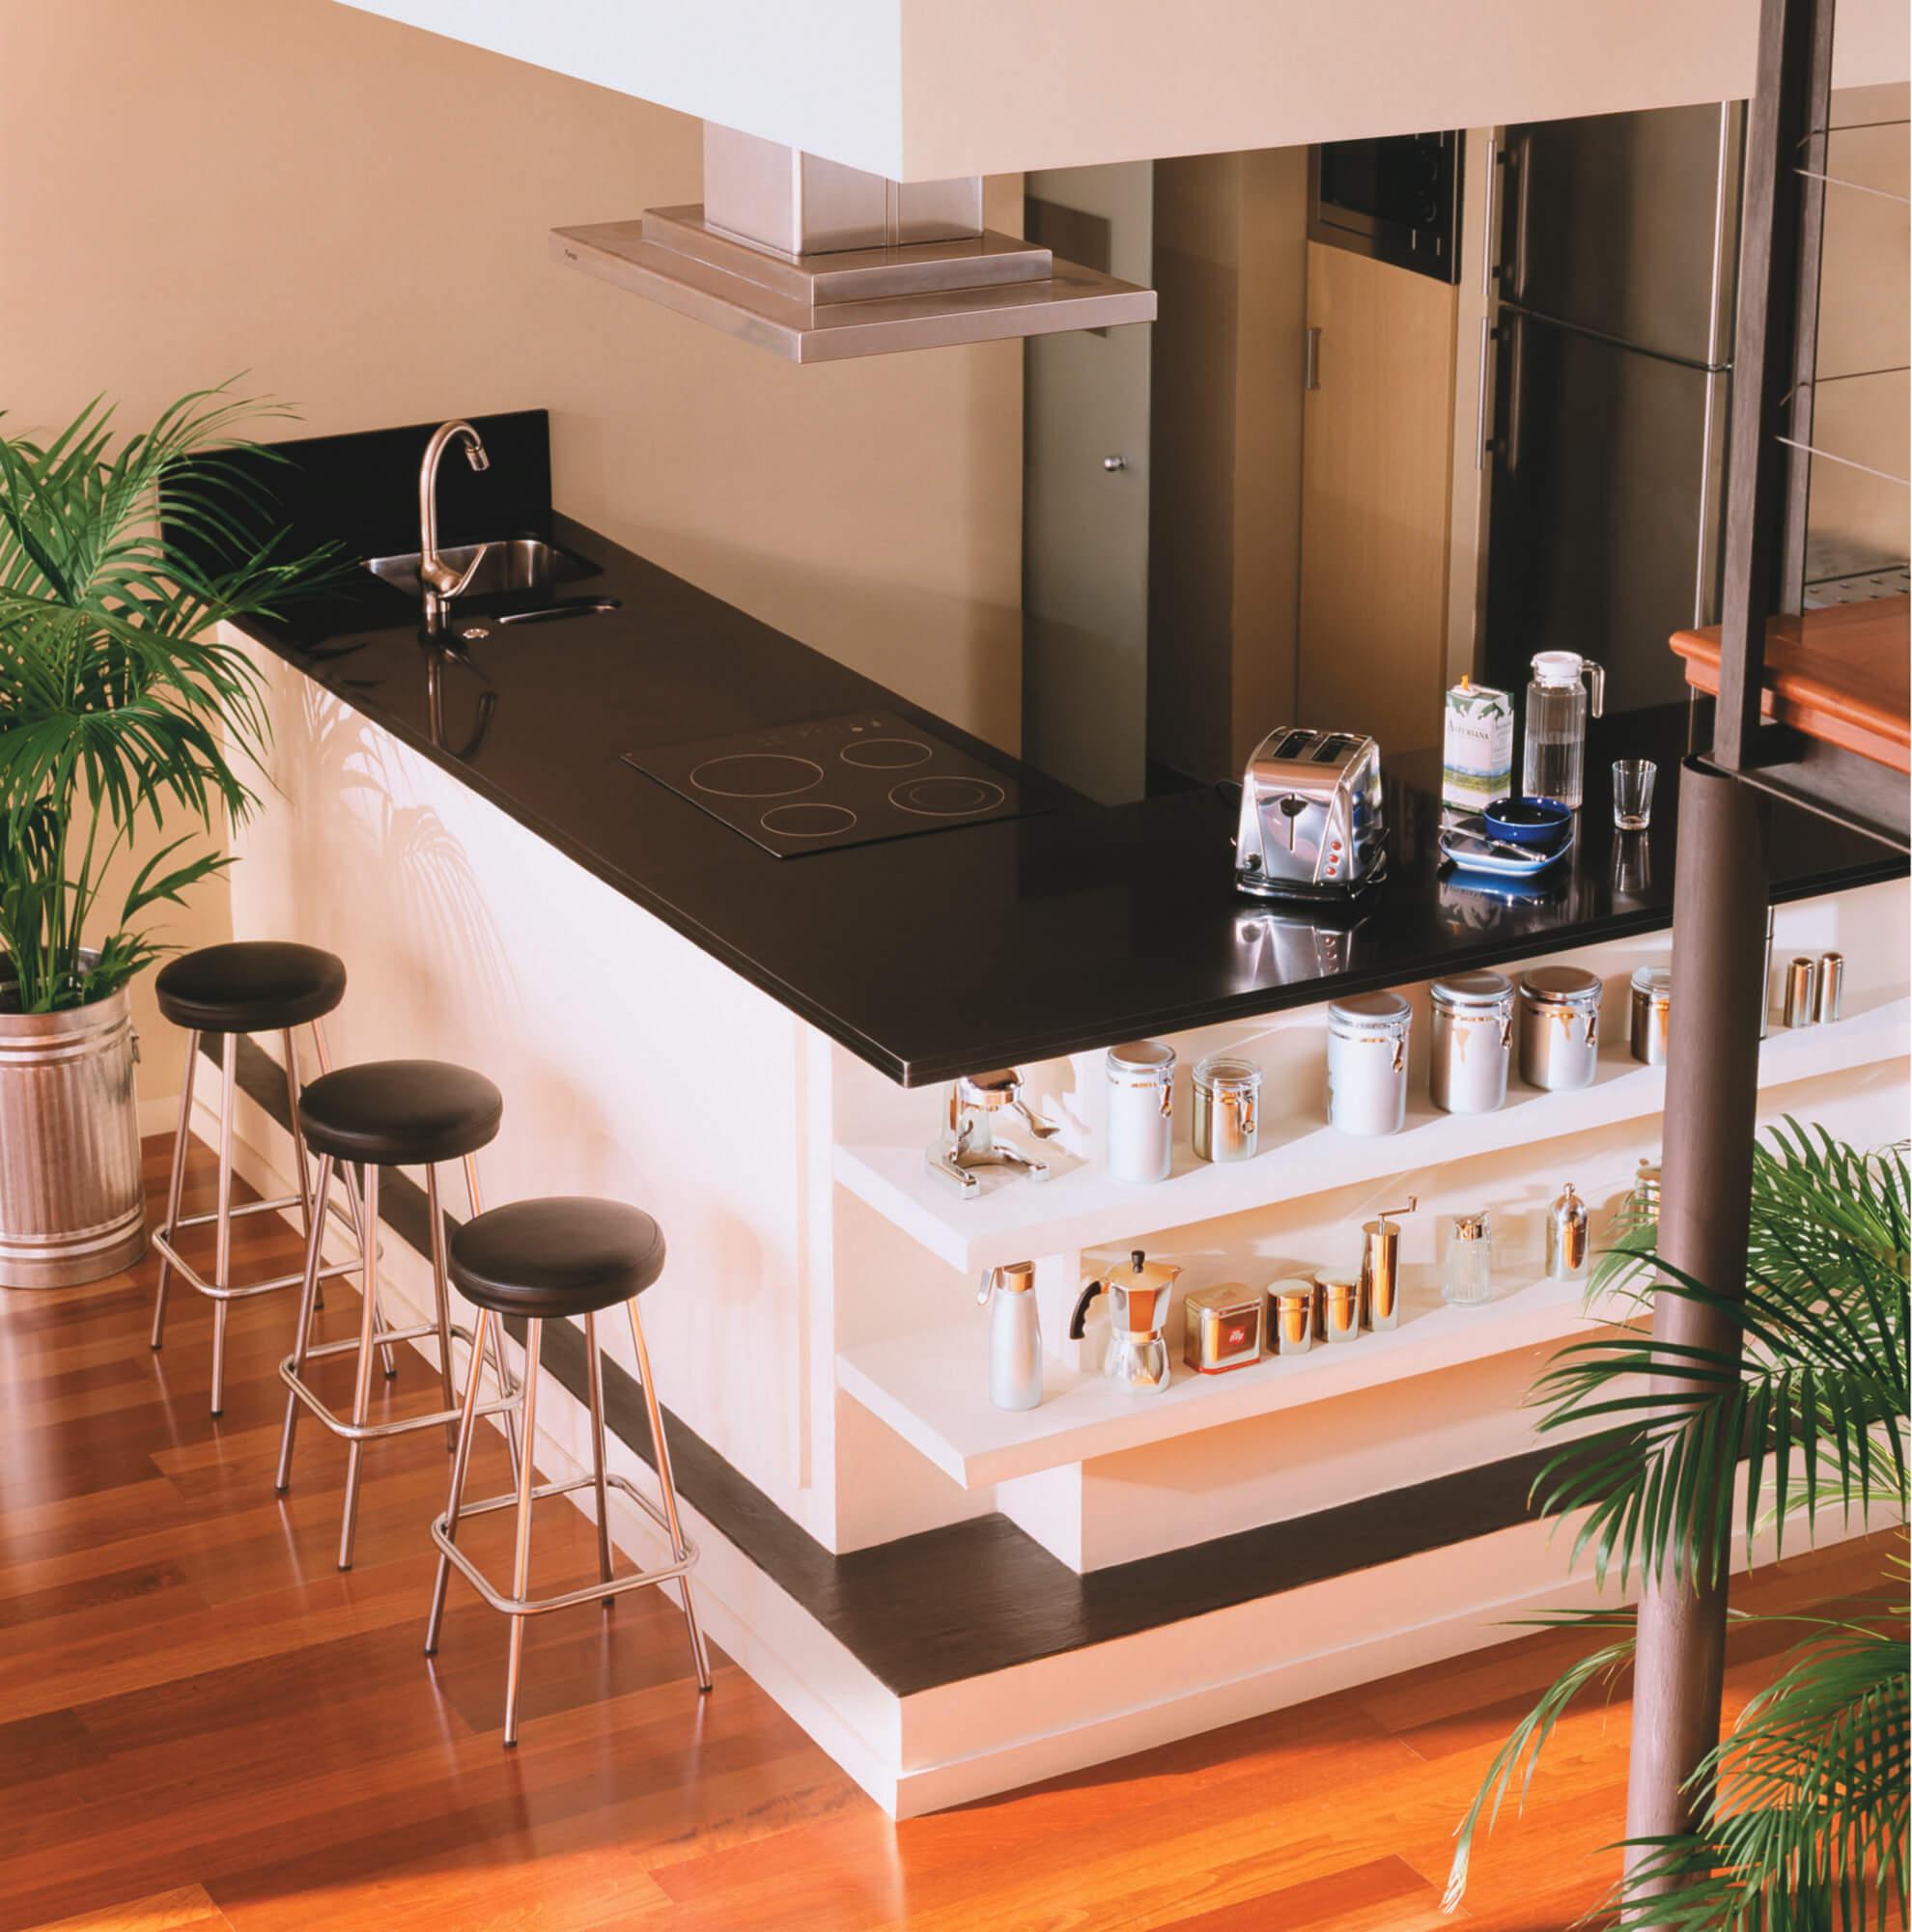 Cosentino Silestone White Kitchen Bar